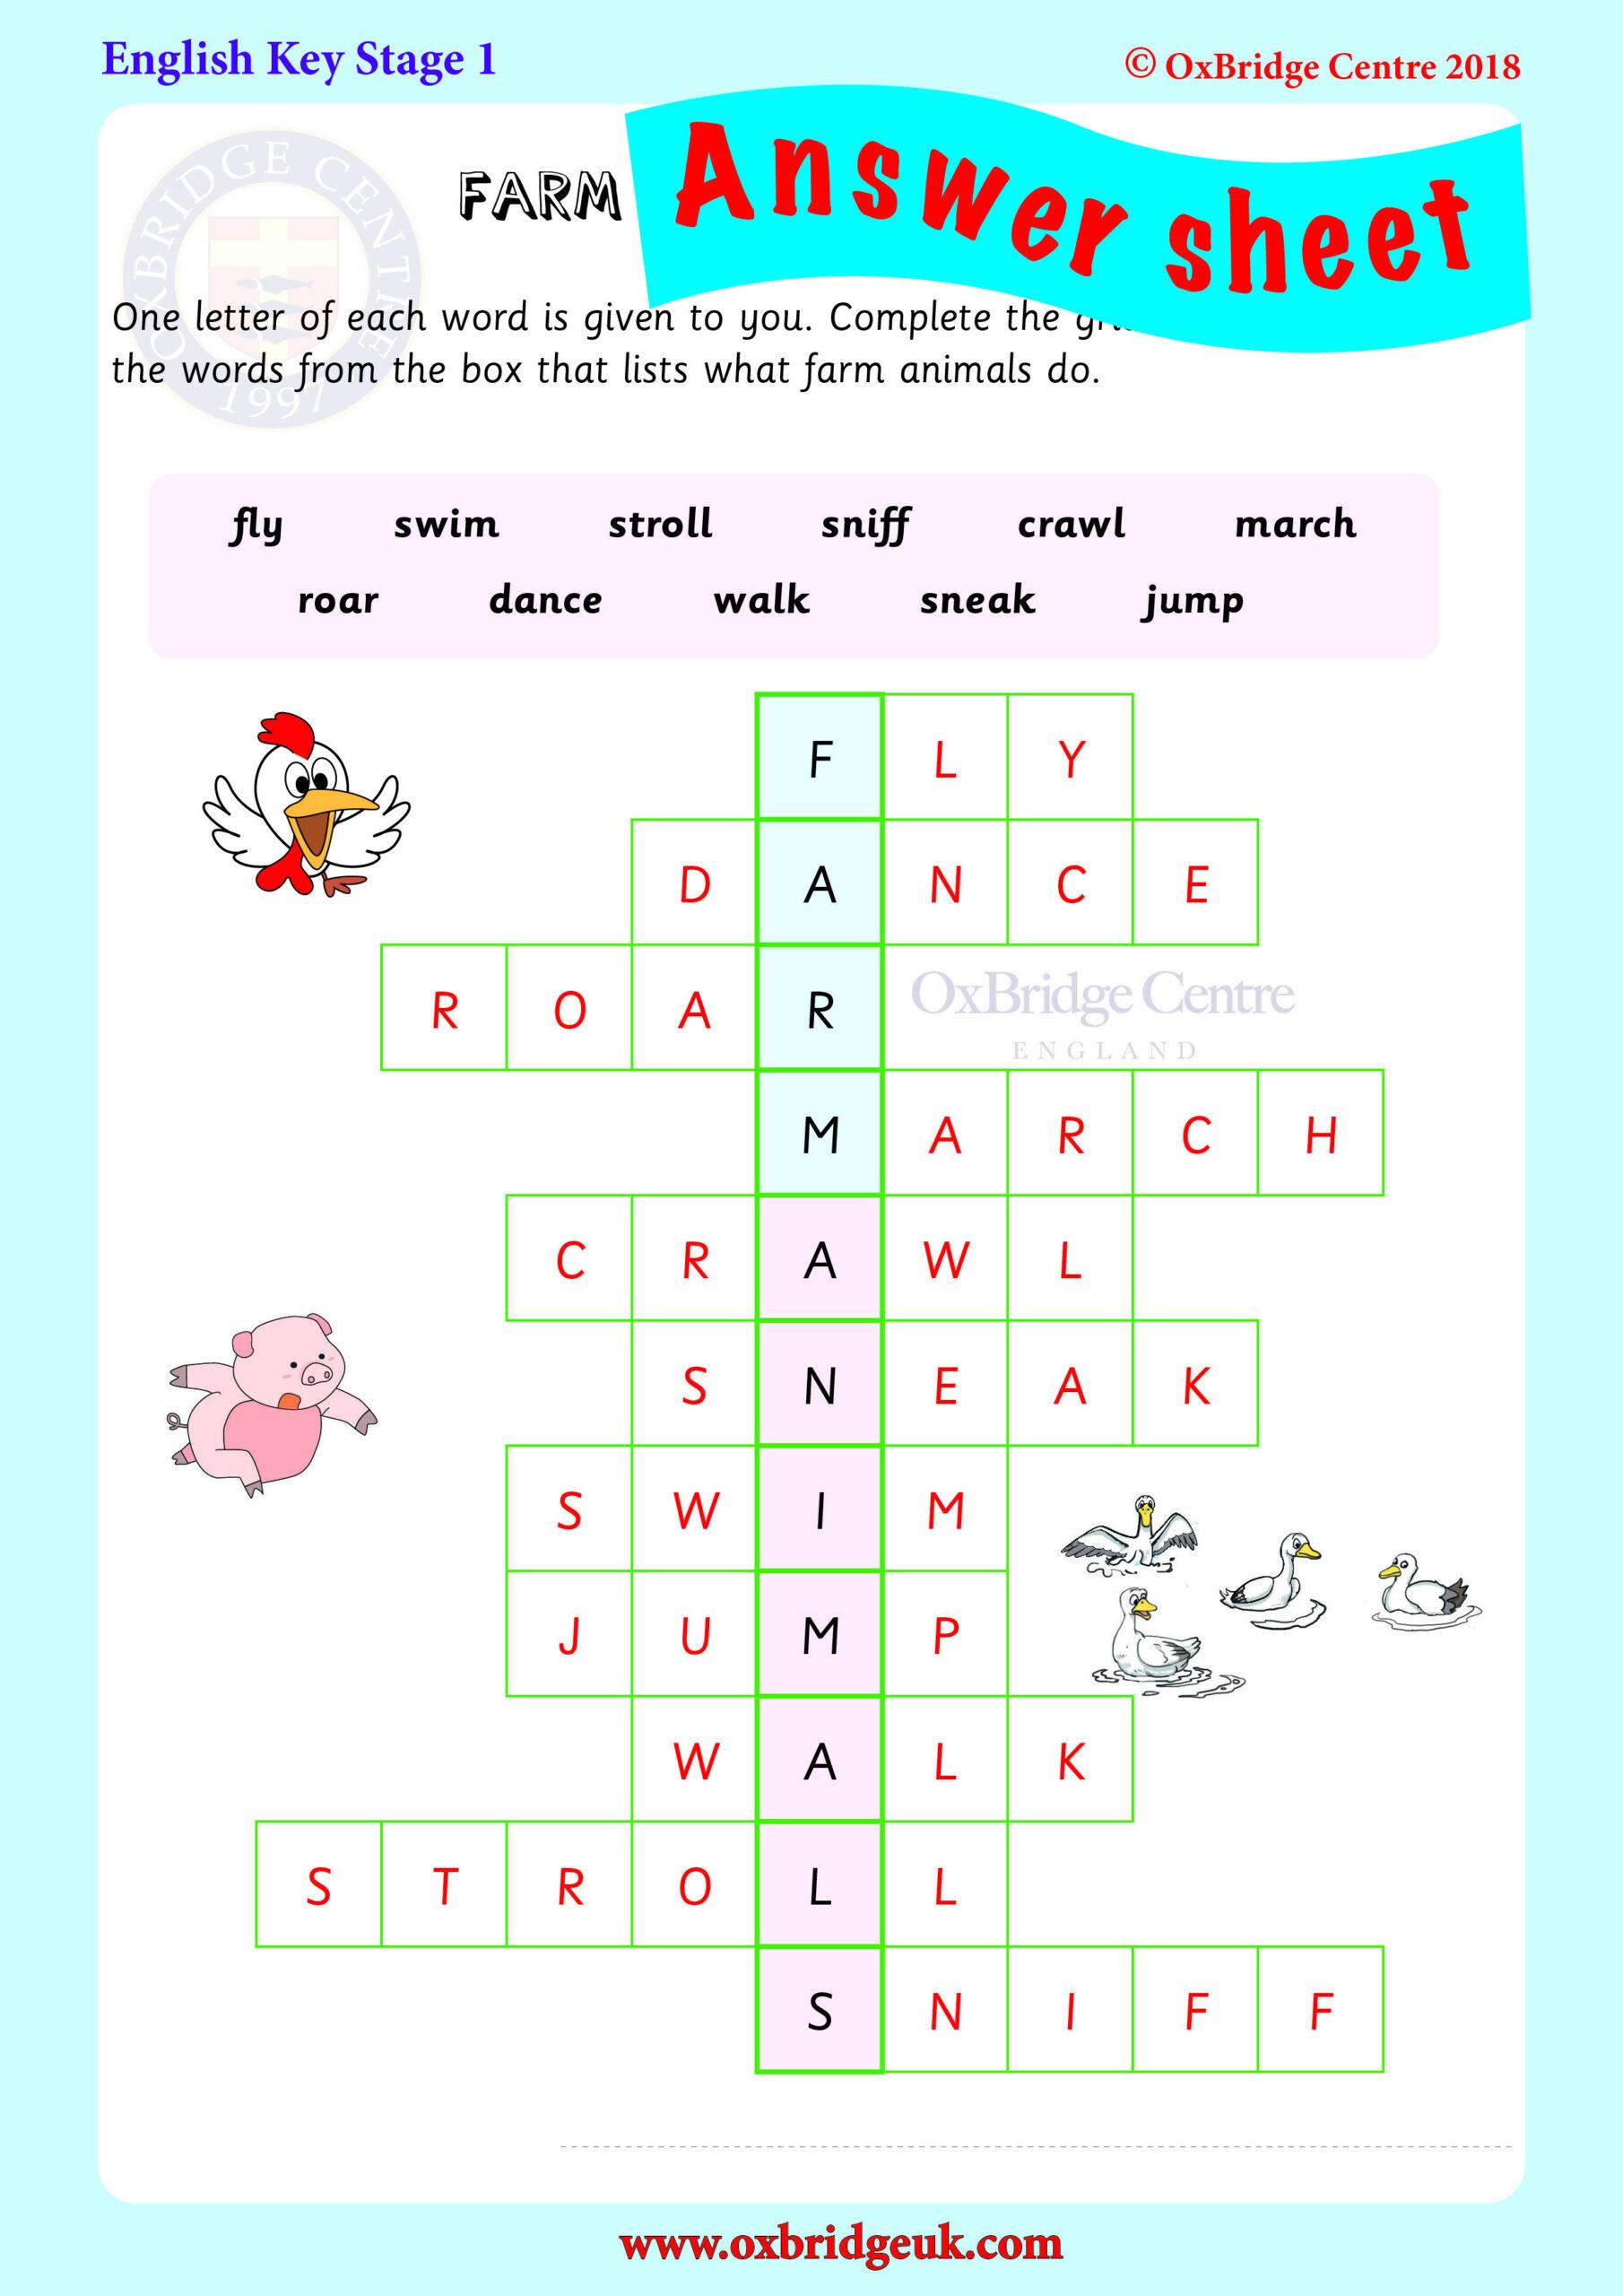 Pinmalleswari Devi On Ks1 English: Oxbridge Centre's regarding Key Stage 1 Alphabet Worksheets